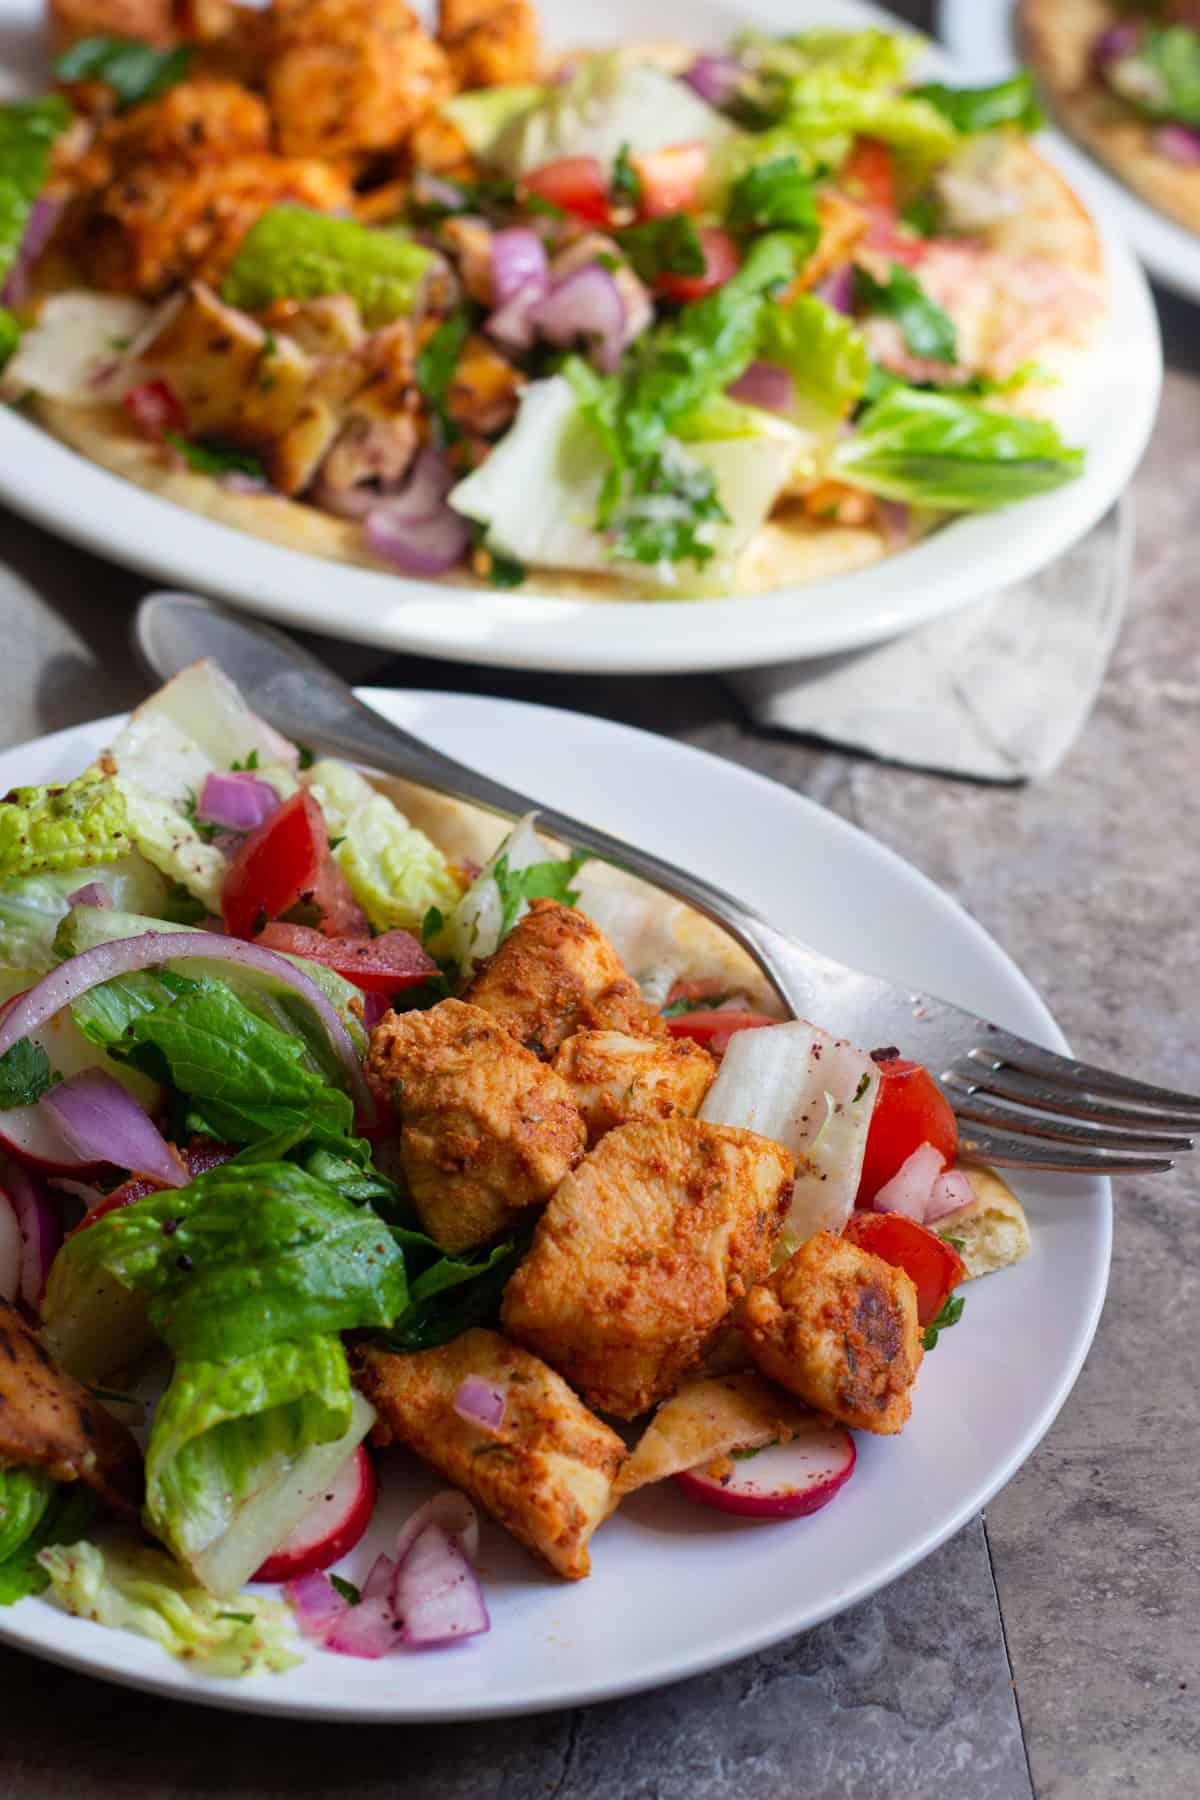 Serve chicken shish with salad and pita bread.